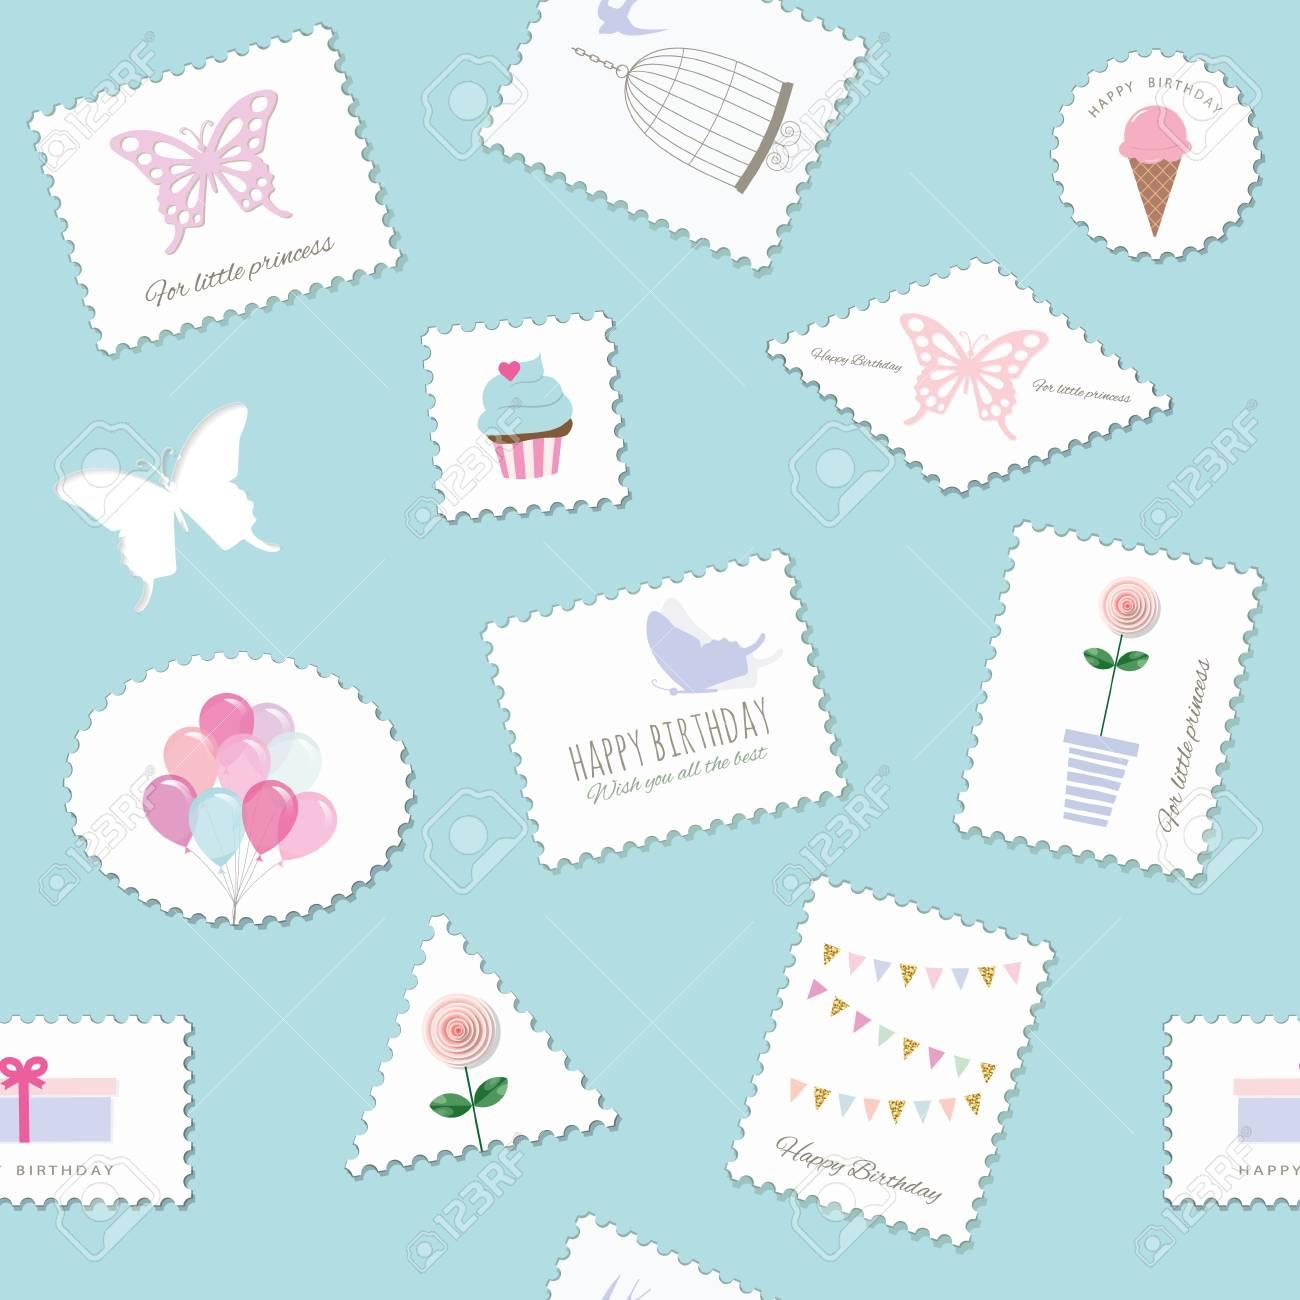 birthday seamless pattern with